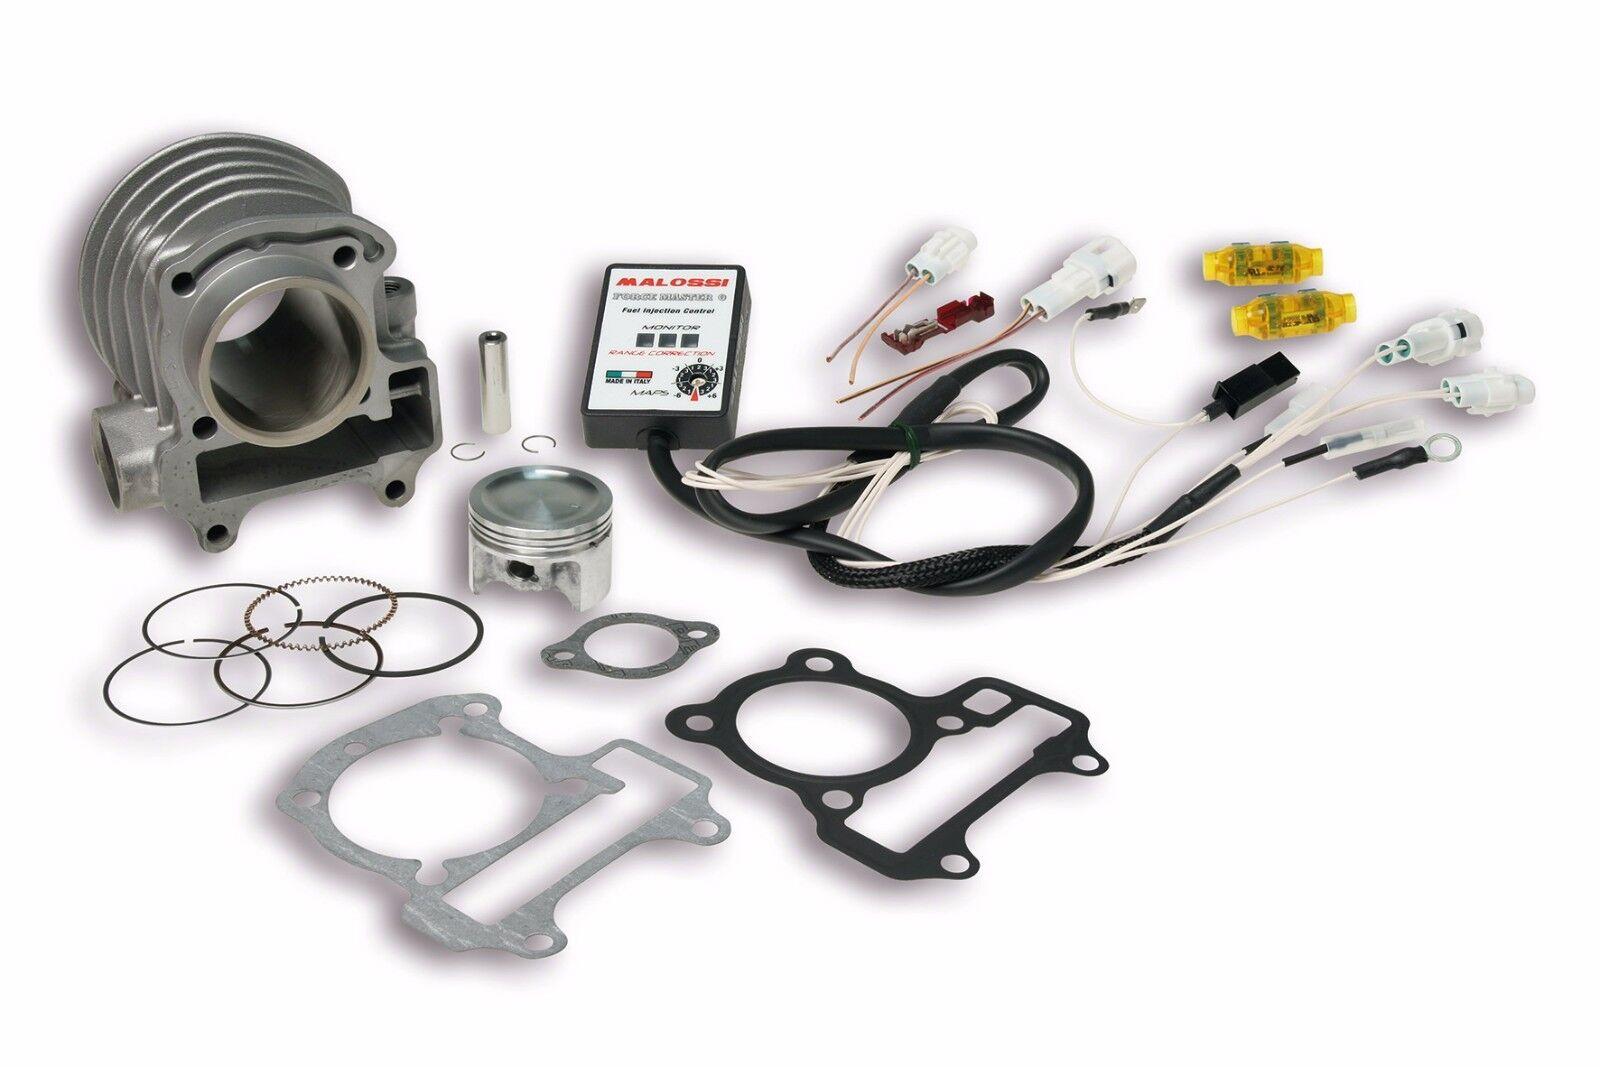 Malossi 85cc Big Bore Cylinder Kit For Honda Metropolitan Ebay Wiring Harness Norton Secured Powered By Verisign